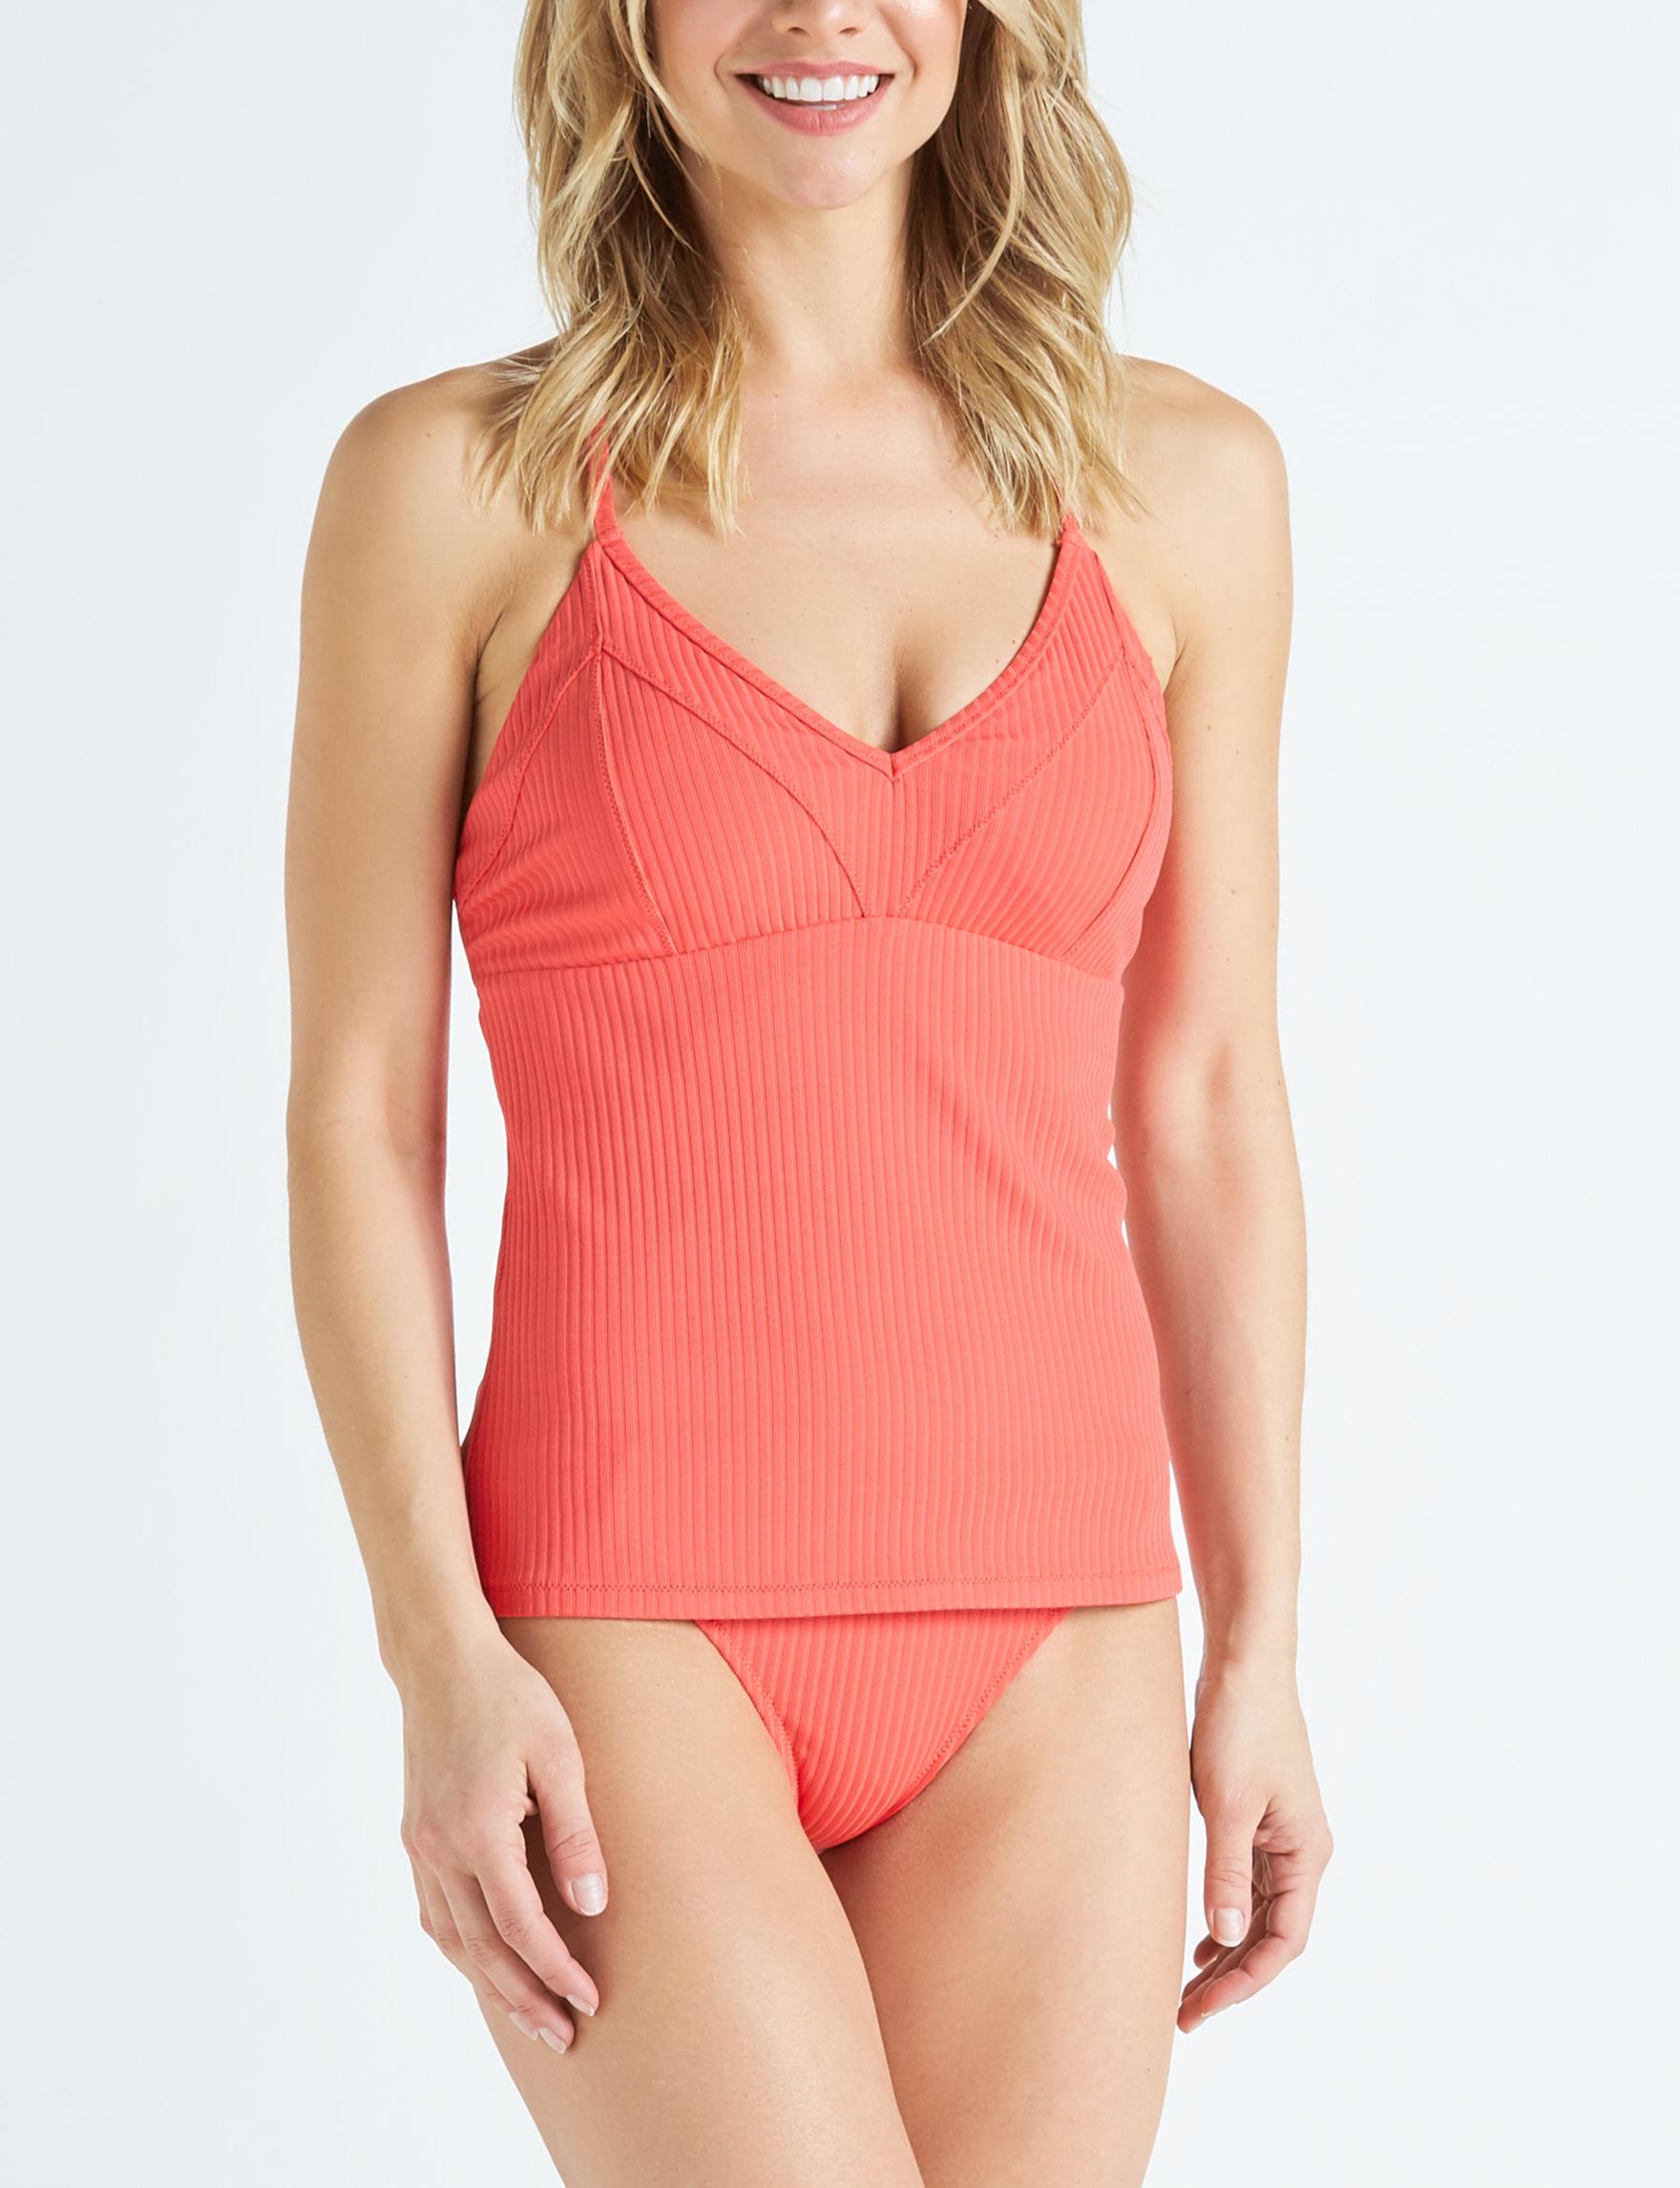 Jessica Simpson Red Swimsuit Tops Tankini